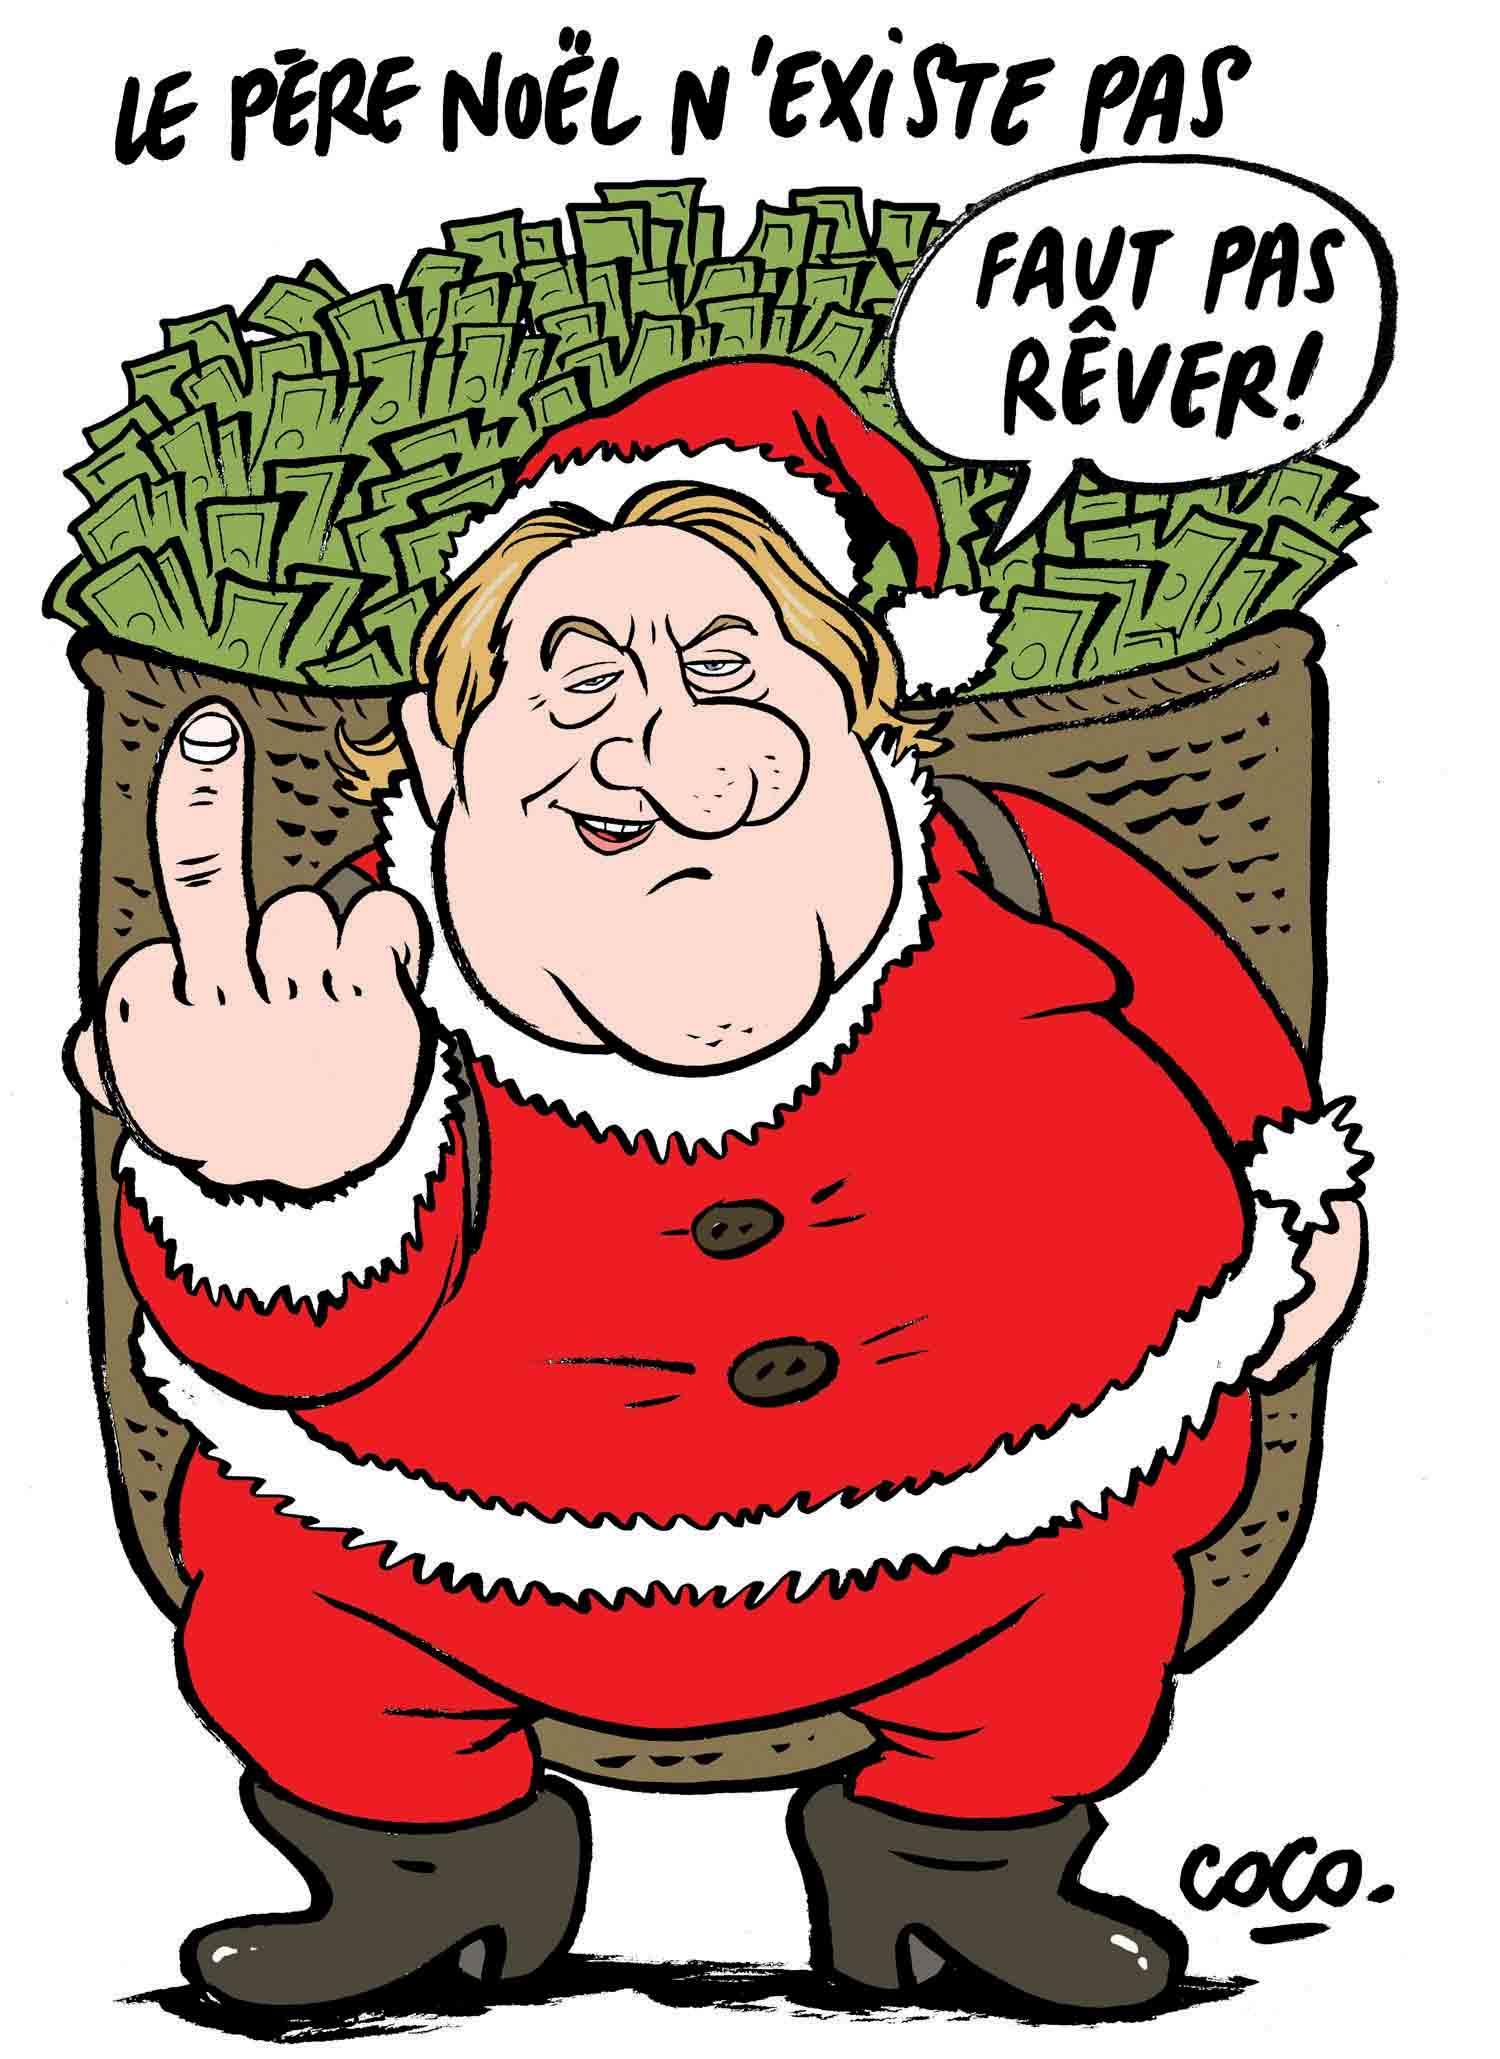 dessin humour noel 2018 NOEL PPS 2017 MERE NOEL DESSIN DIAPORAMA HUMOUR NOUVEL AN 2018  dessin humour noel 2018